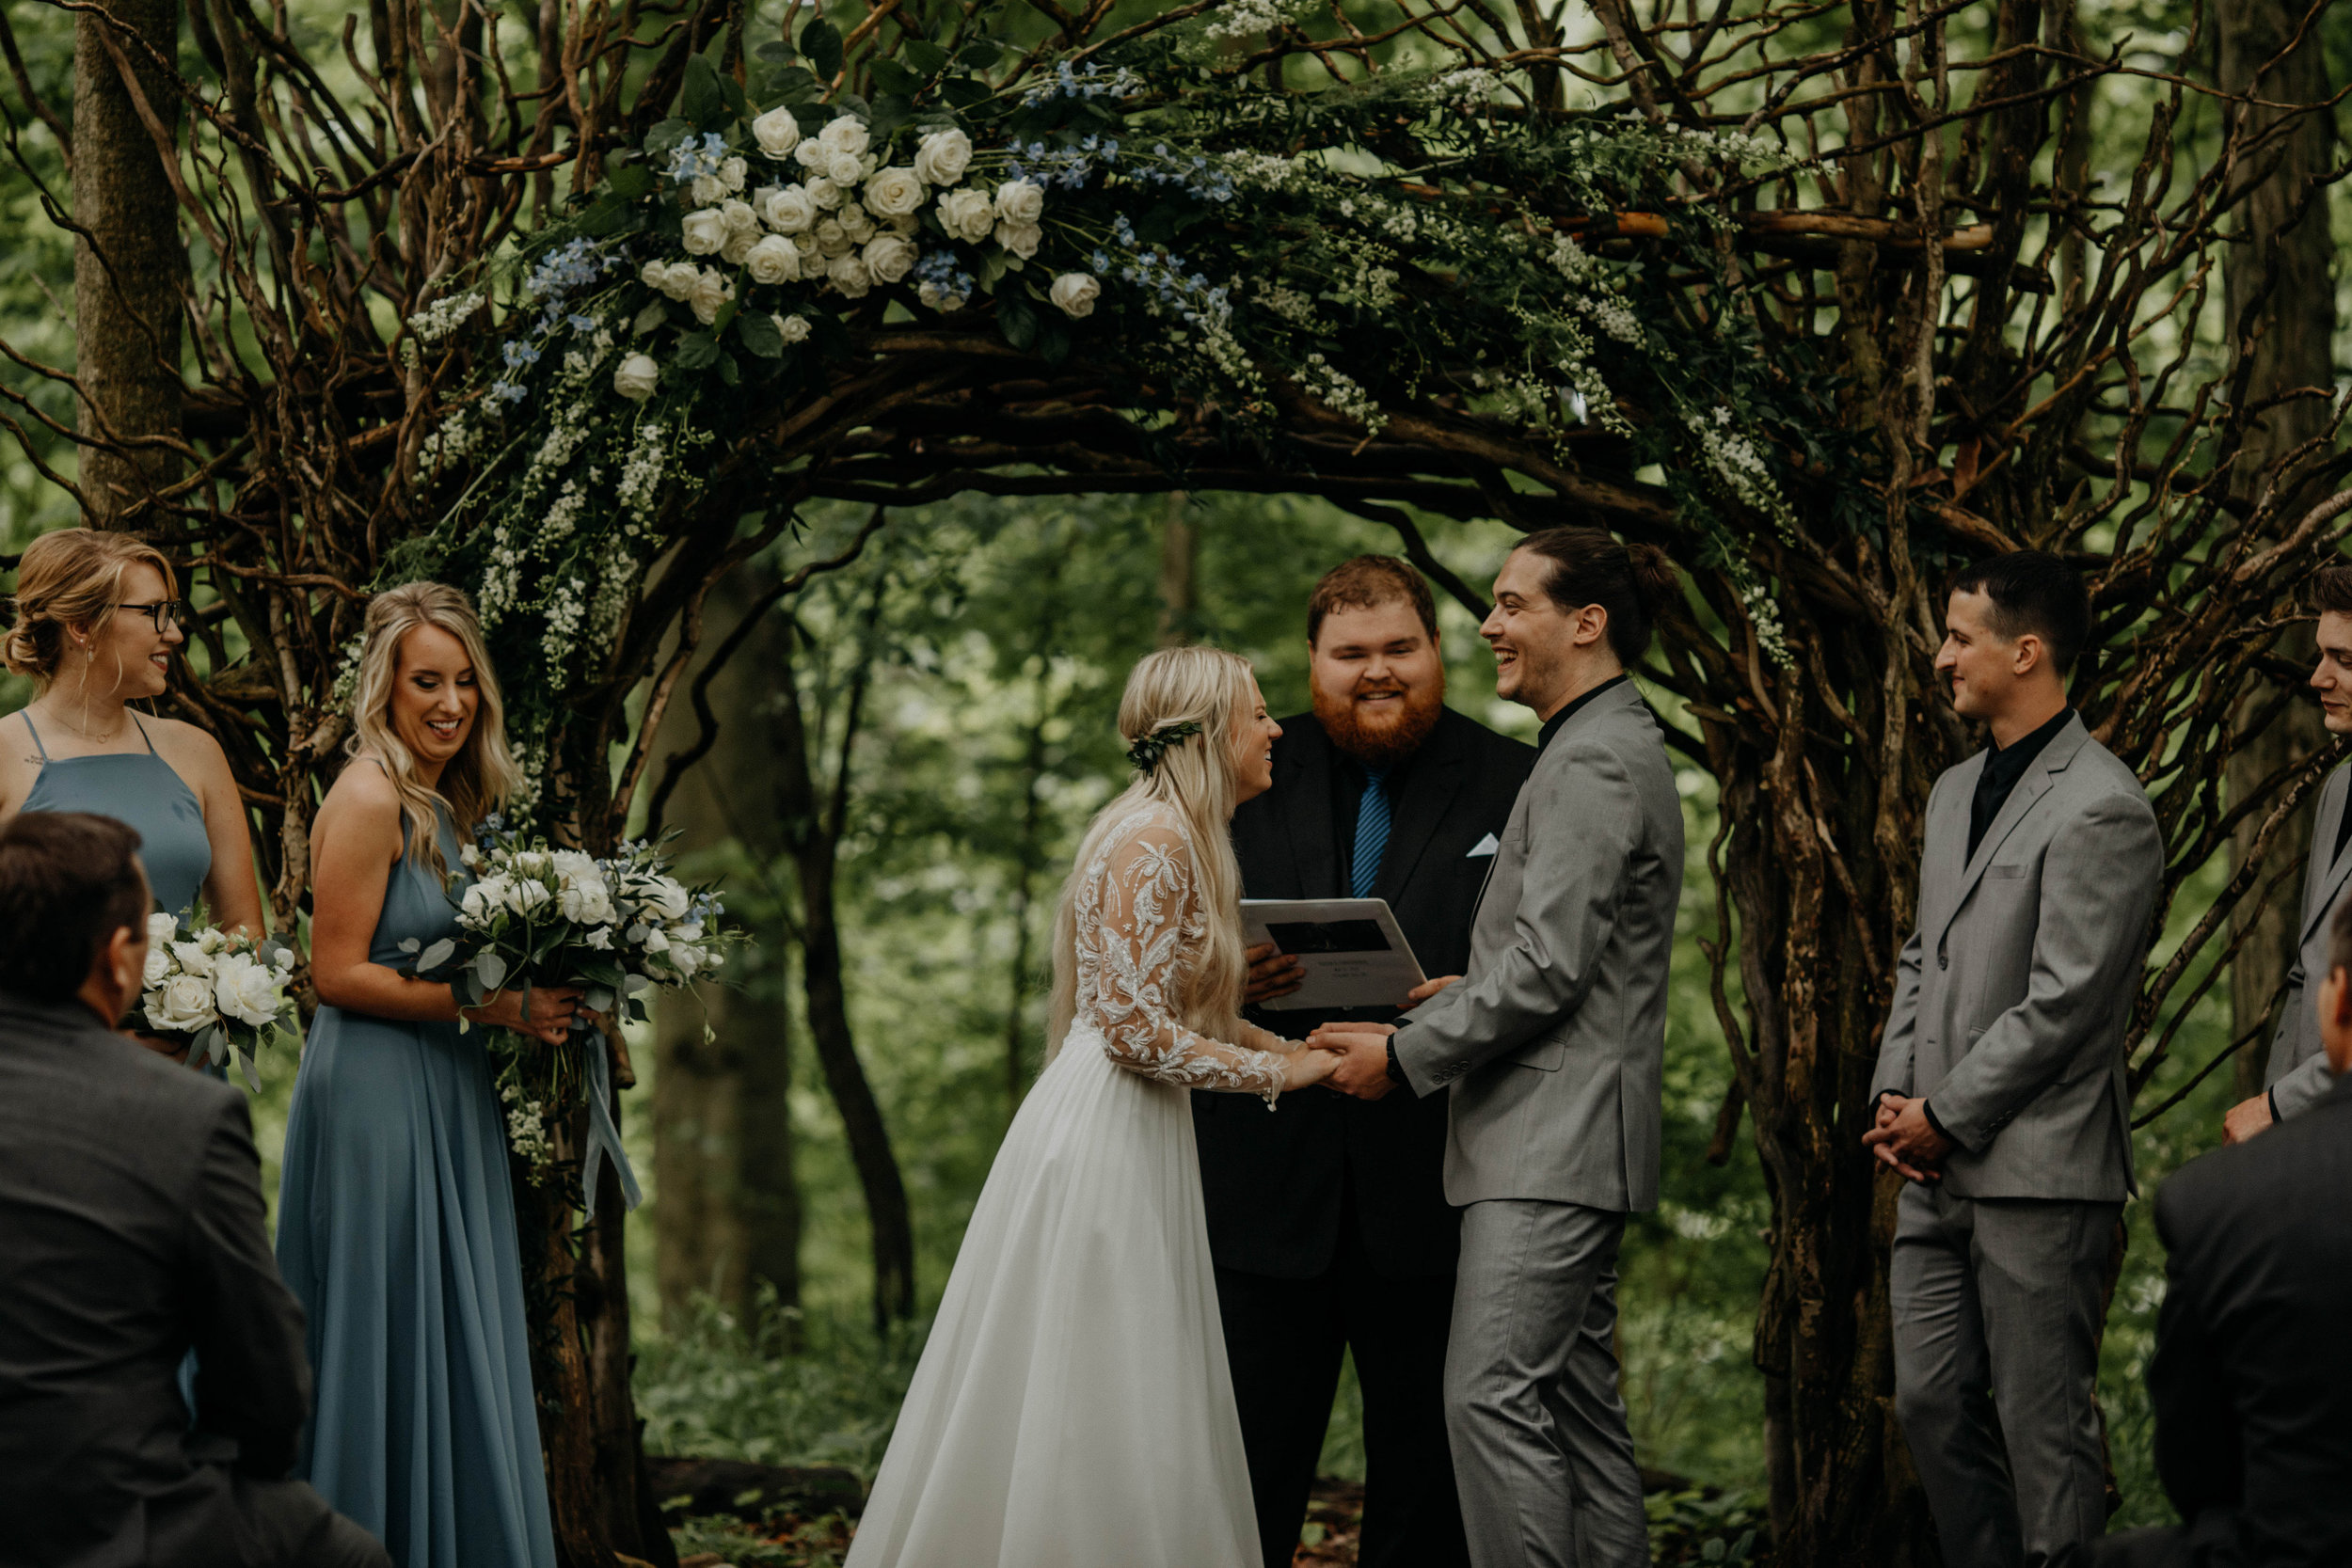 Columbus ohio wedding photographer canyon run ranch wedding grace e jones photography wedding photographer54.jpg